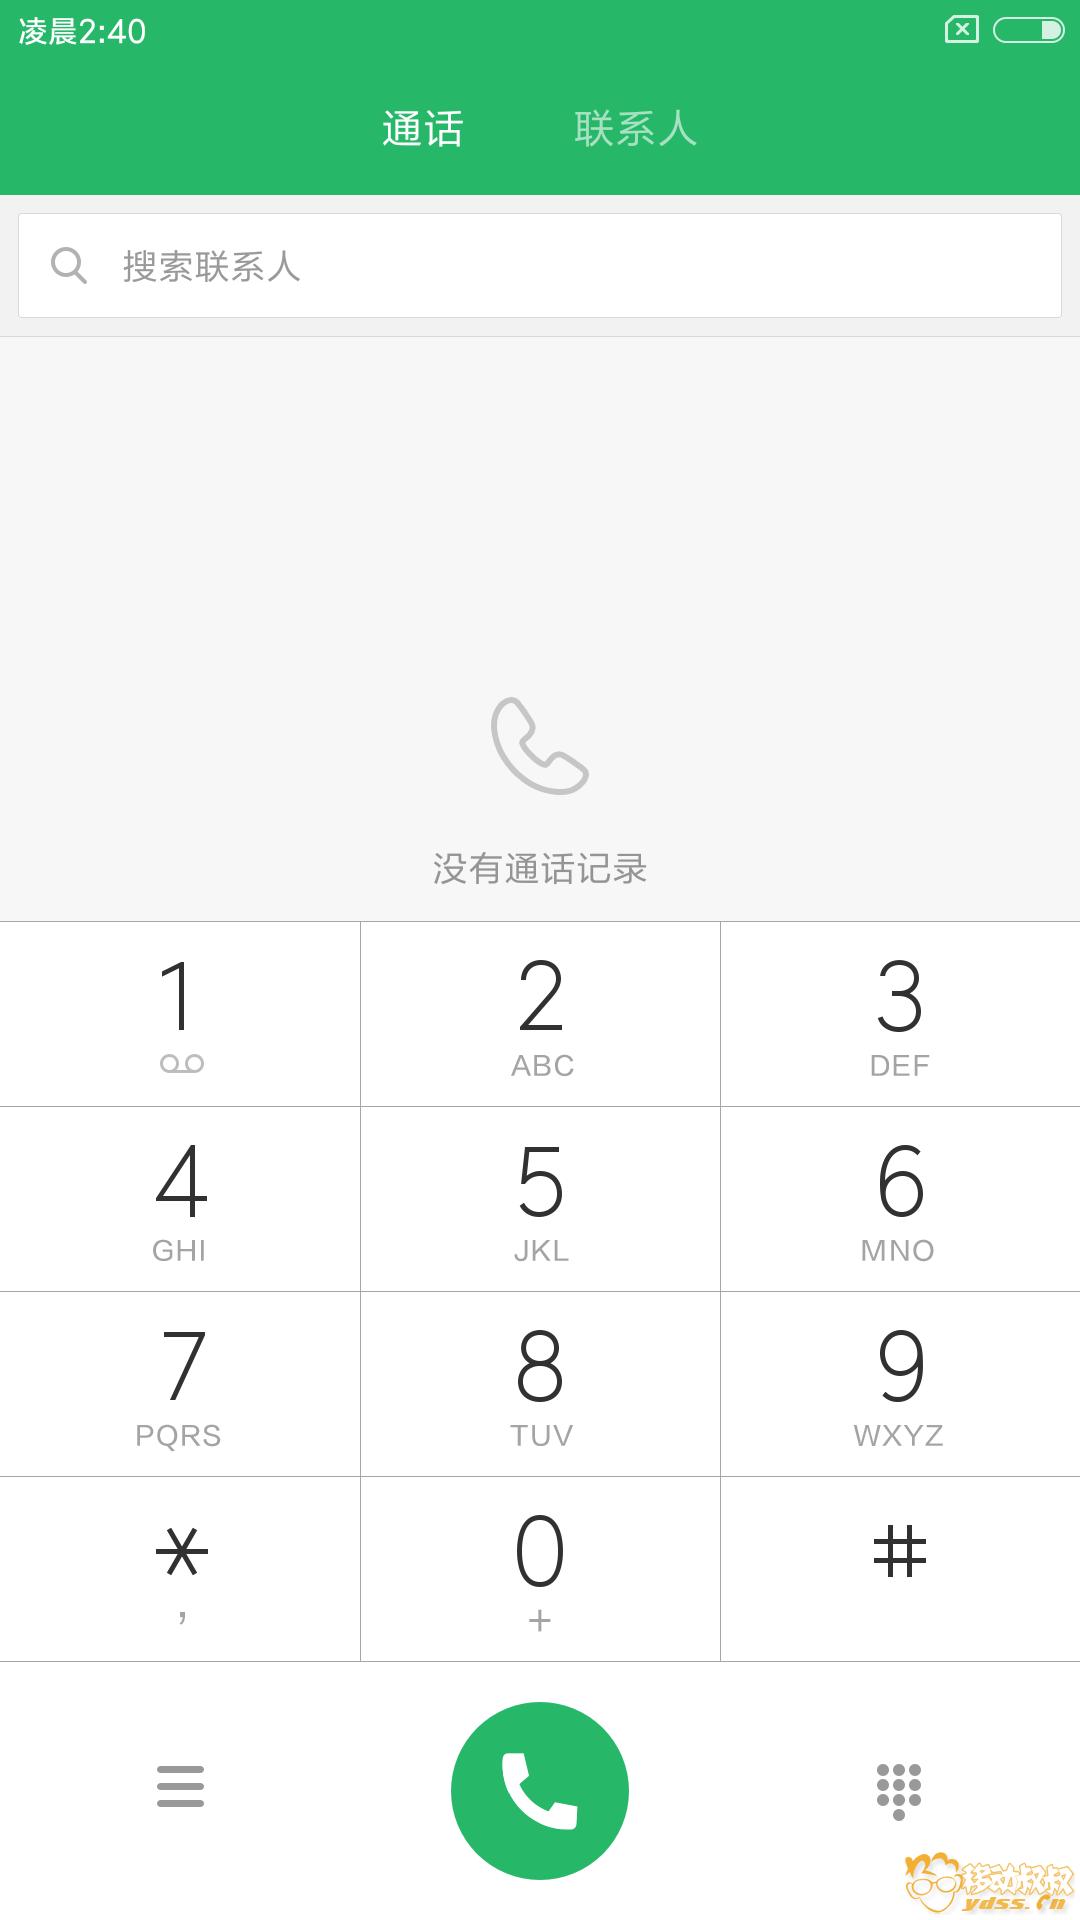 Screenshot_2018-01-04-02-40-57-373_com.android.contacts.png